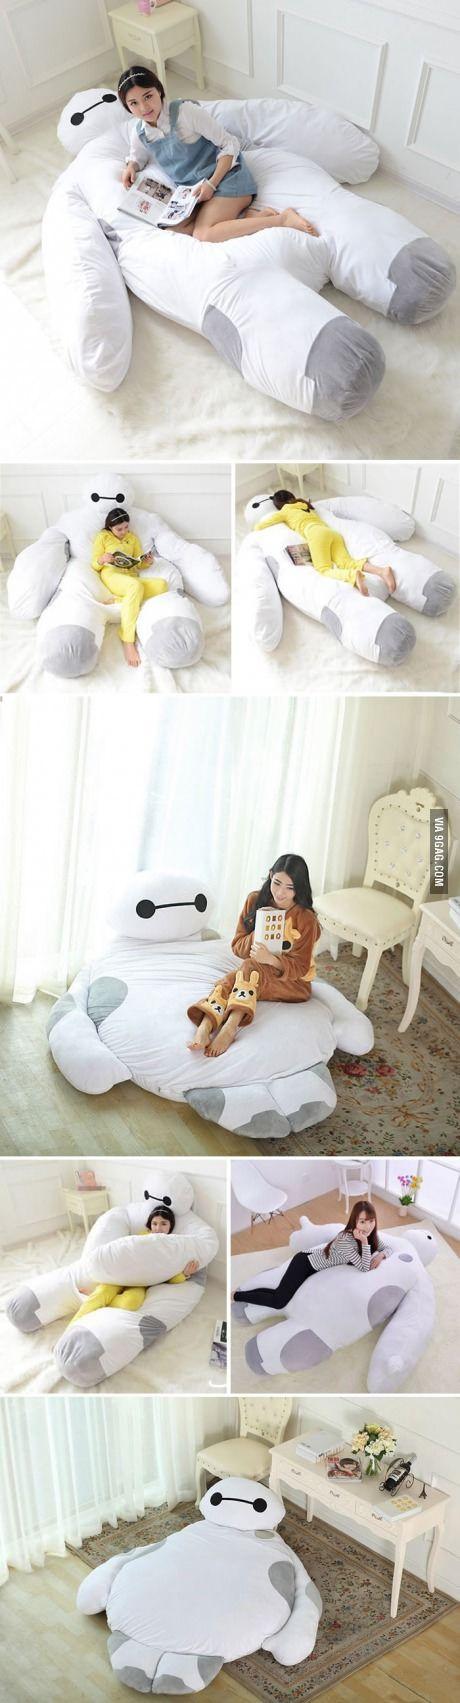 This Life Size Baymax Sofa Bed Is What I Need To Hug While I Sleep! I NEED IT!!!!!!!!! TAKE MY MONEY!!!!!!